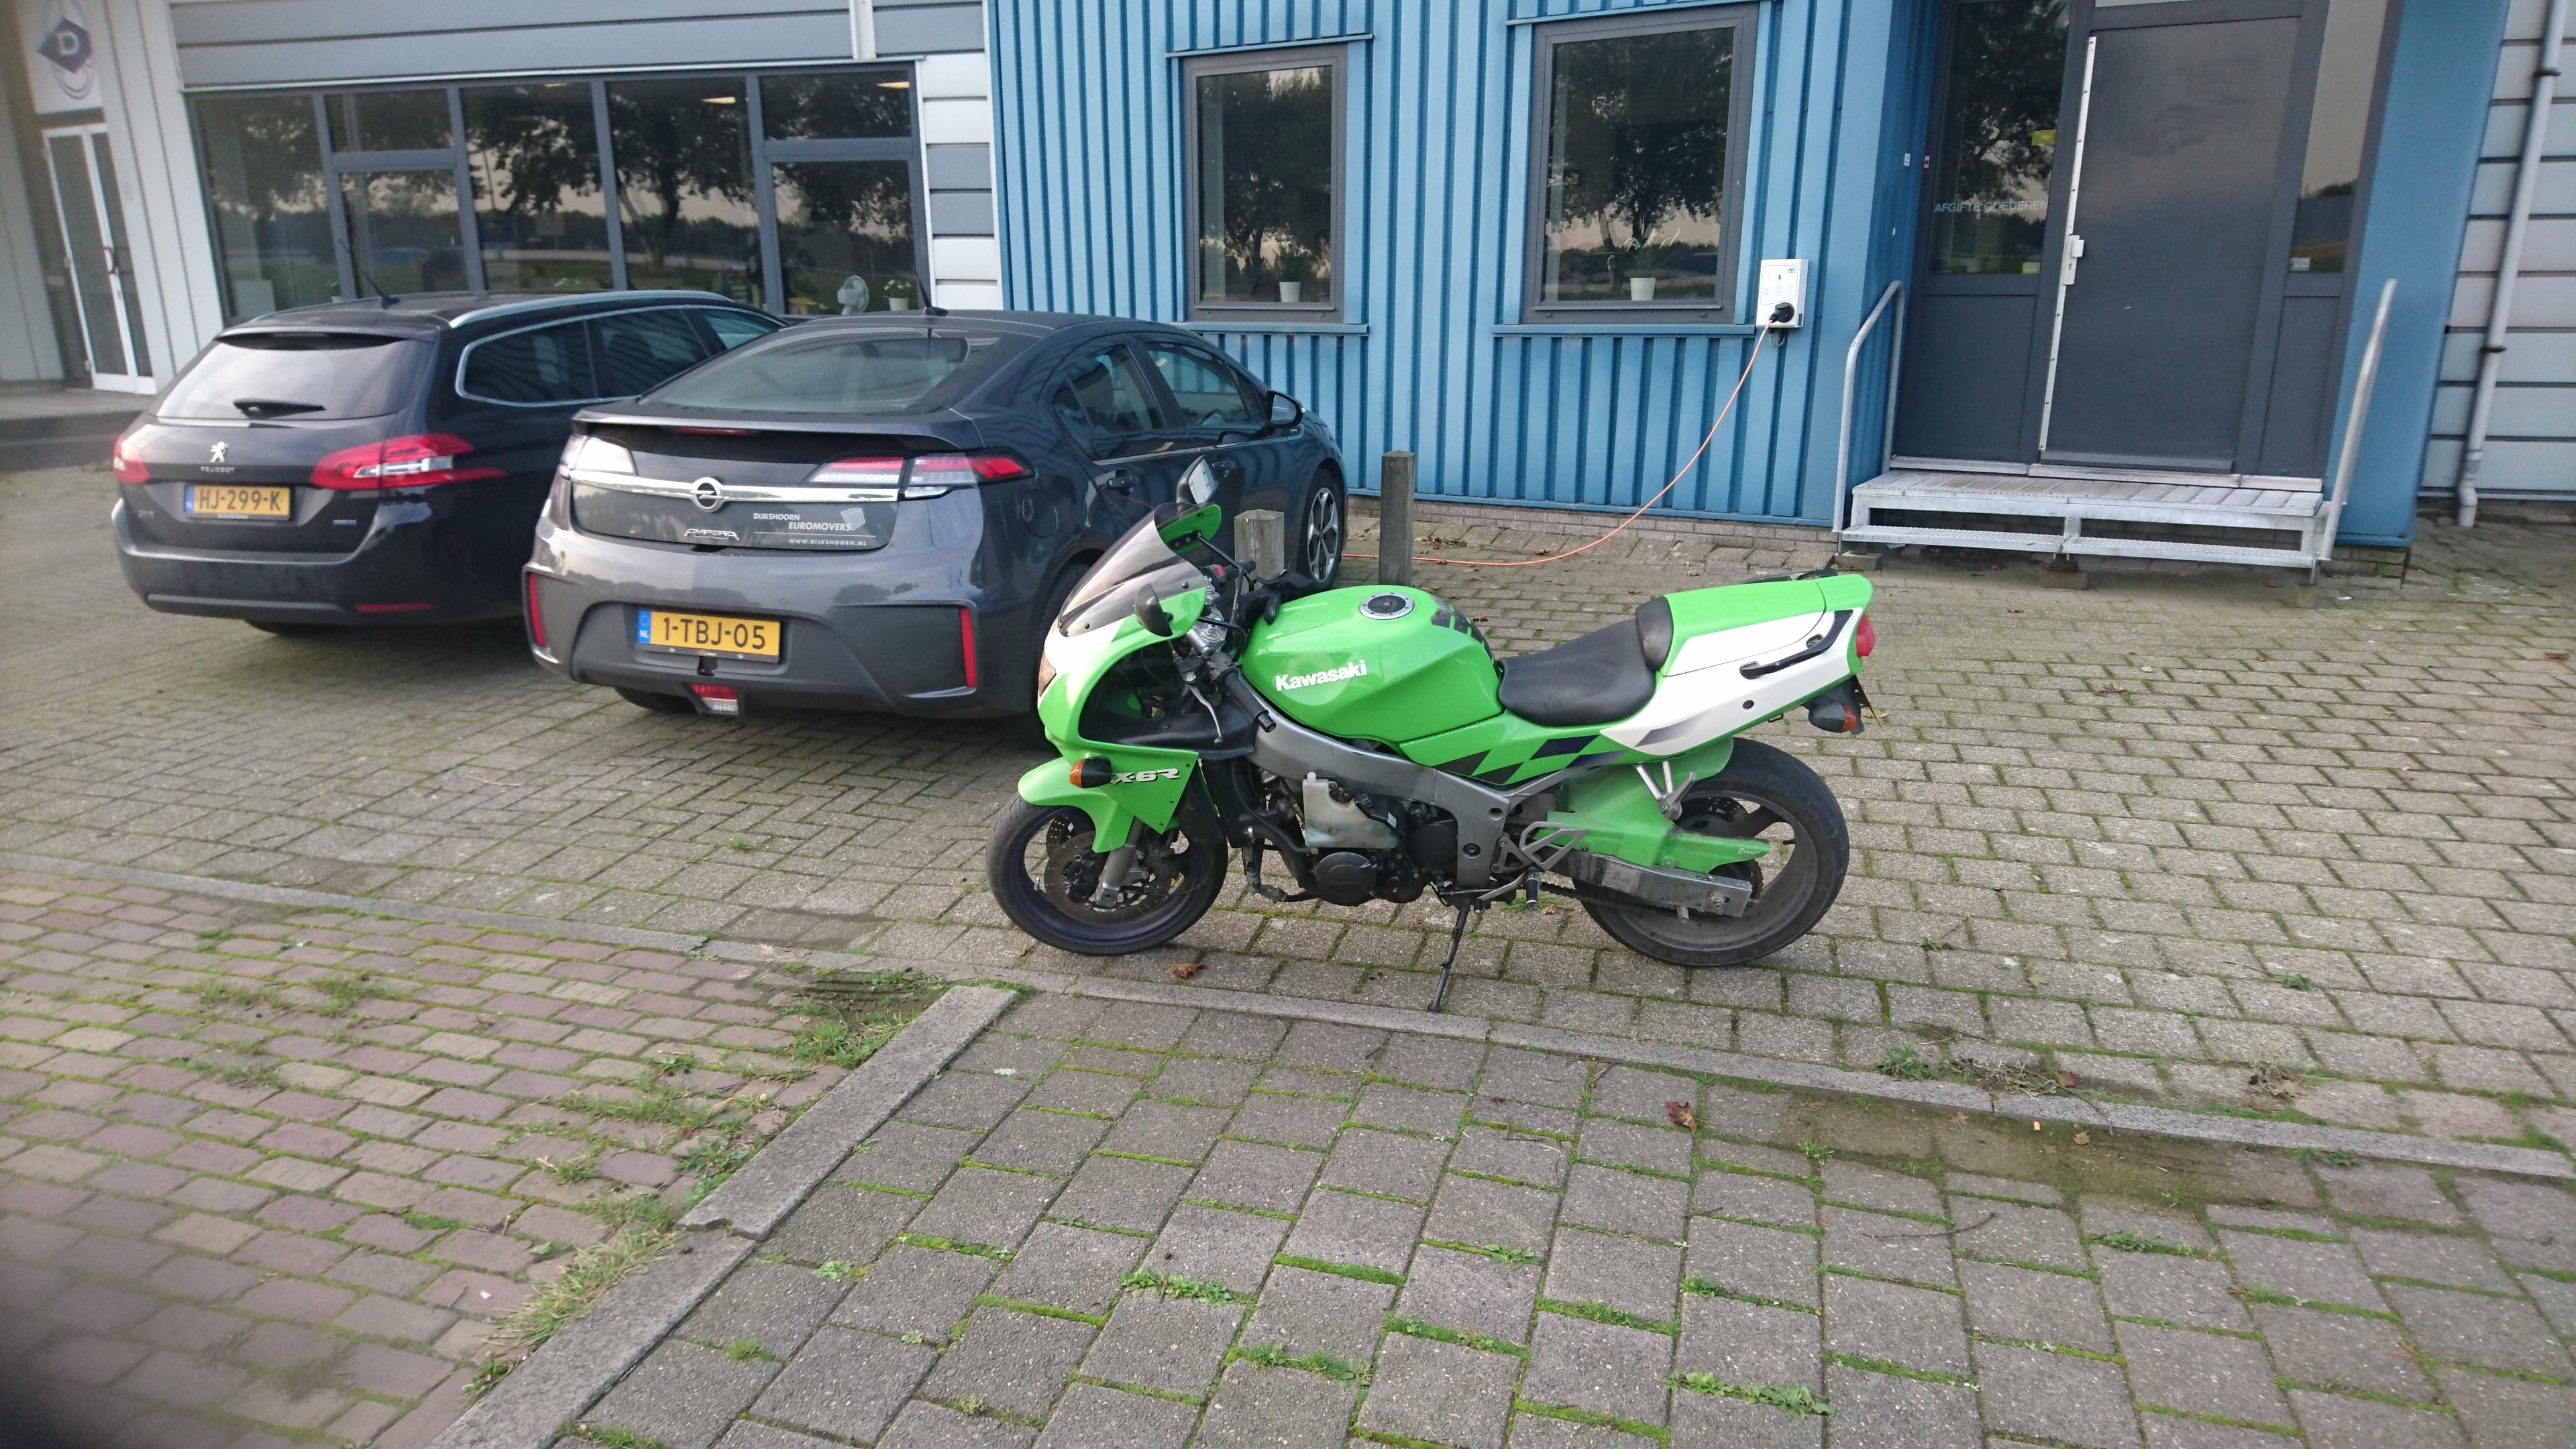 http://piczwart.nl/moto/punten/619.jpg